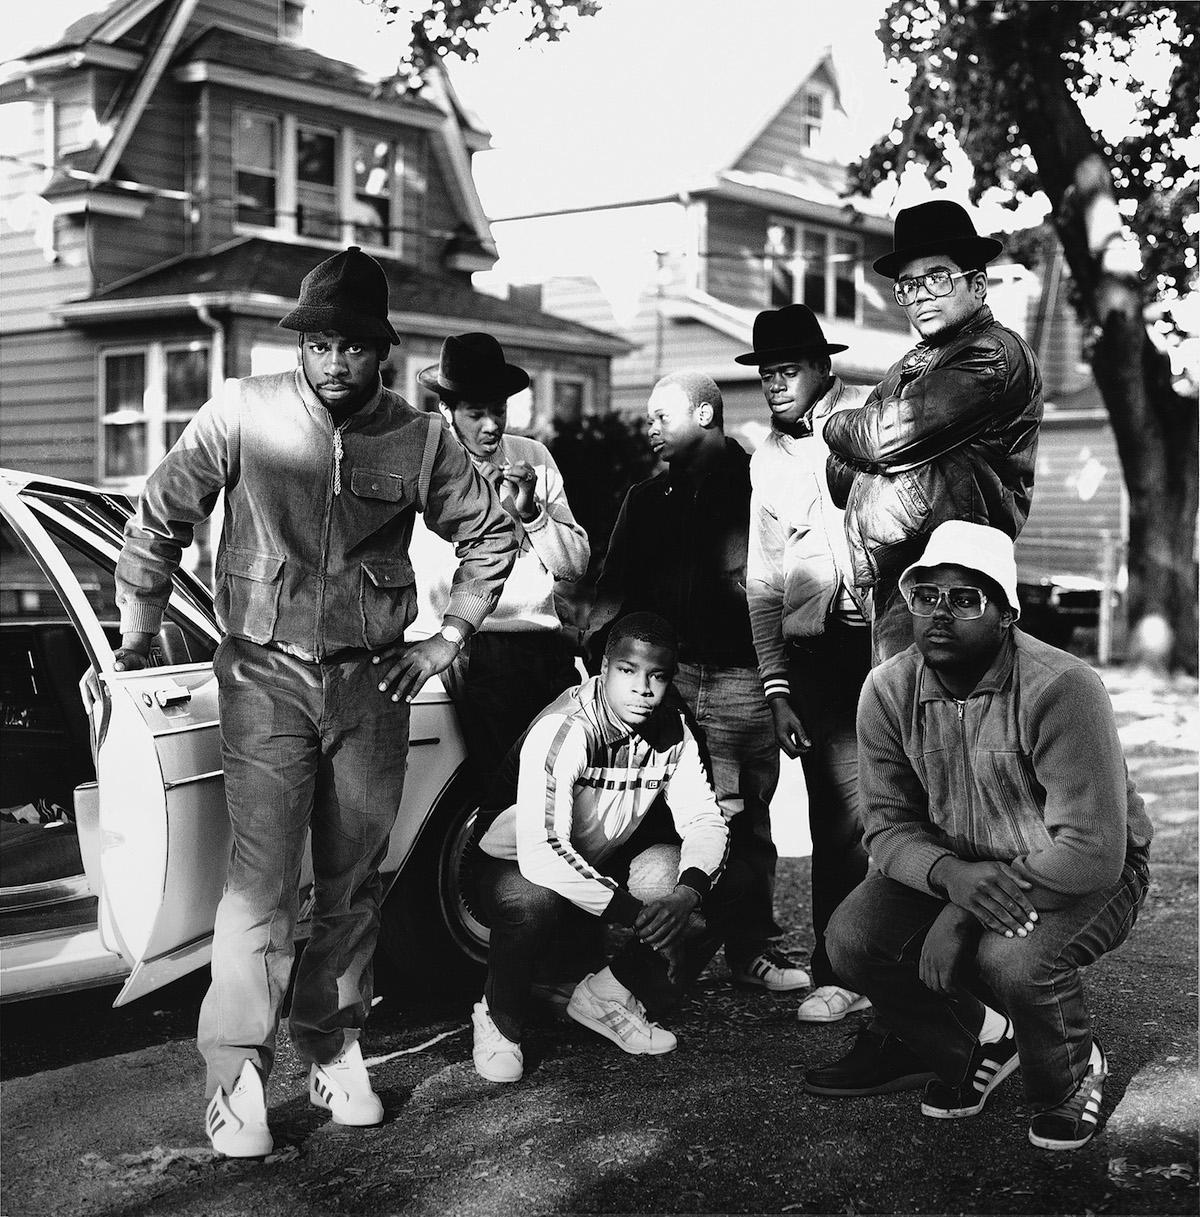 Run DMC & posse Hollis Queens NY ©JanetteBeckman 1984 Courtesy of Fahey:Klein Gallery, Los Angeles